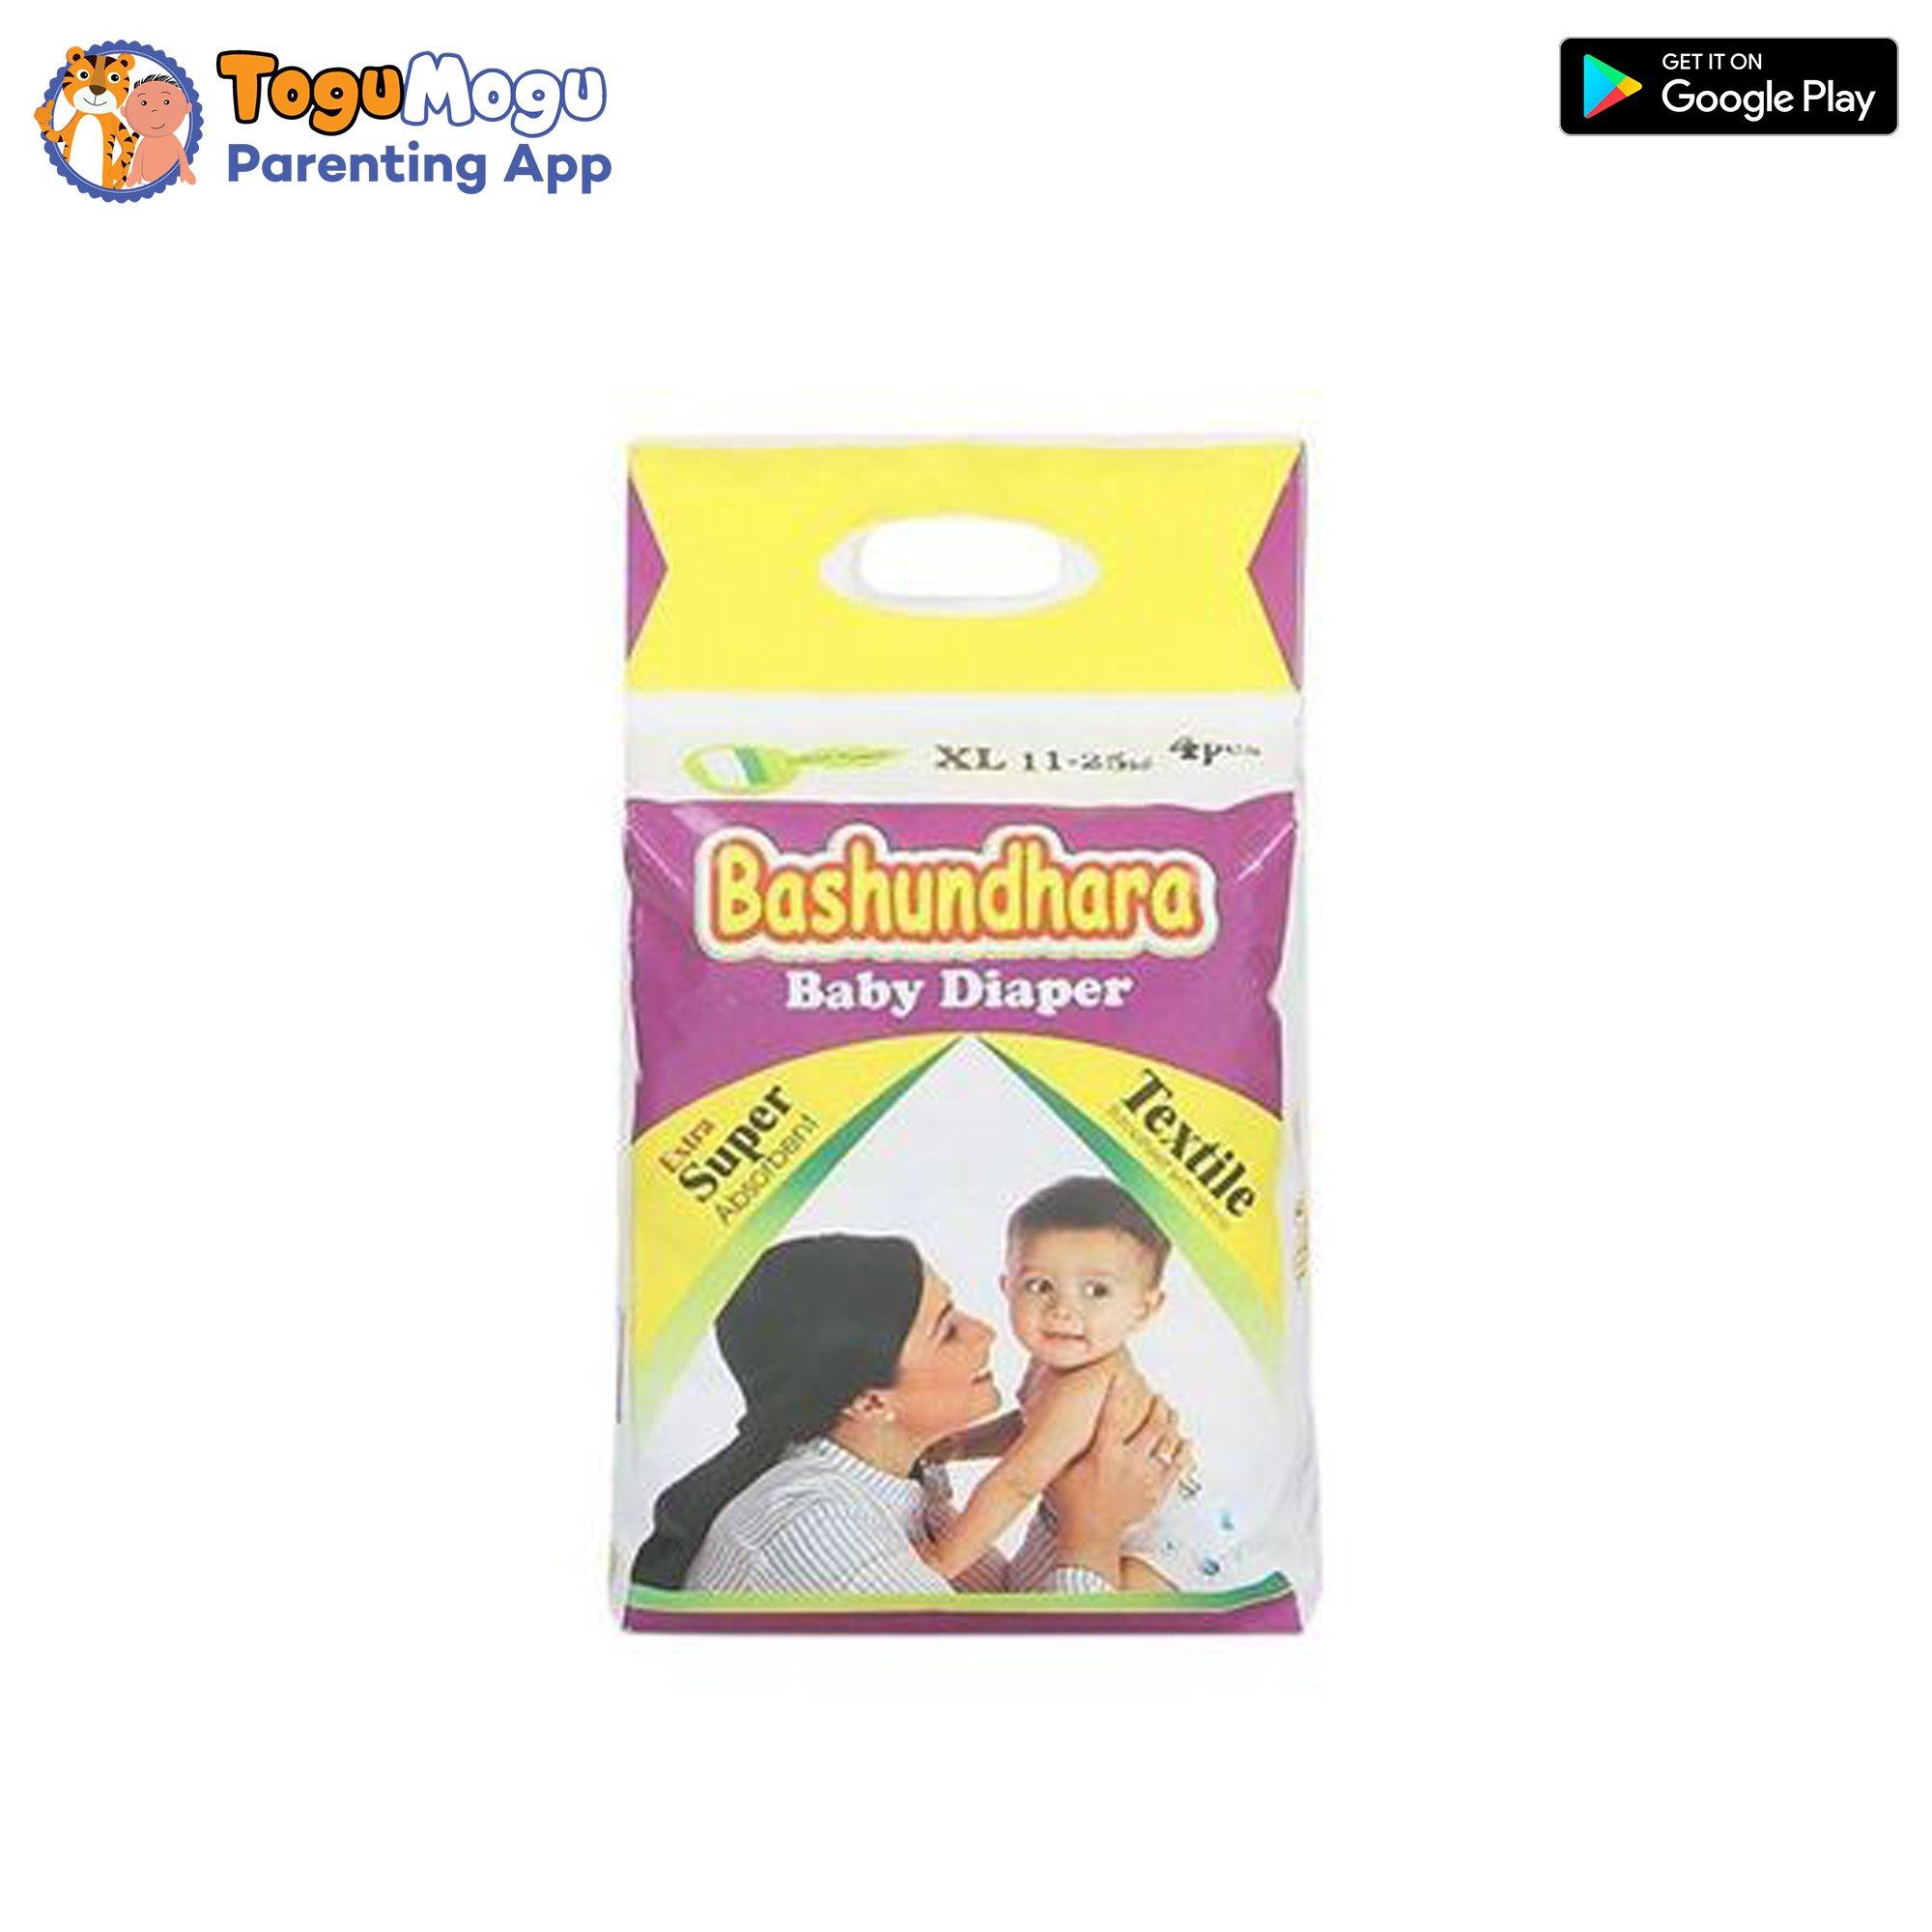 Bashundhara Baby Diaper Belt XL 11-25 kg 4 pcs